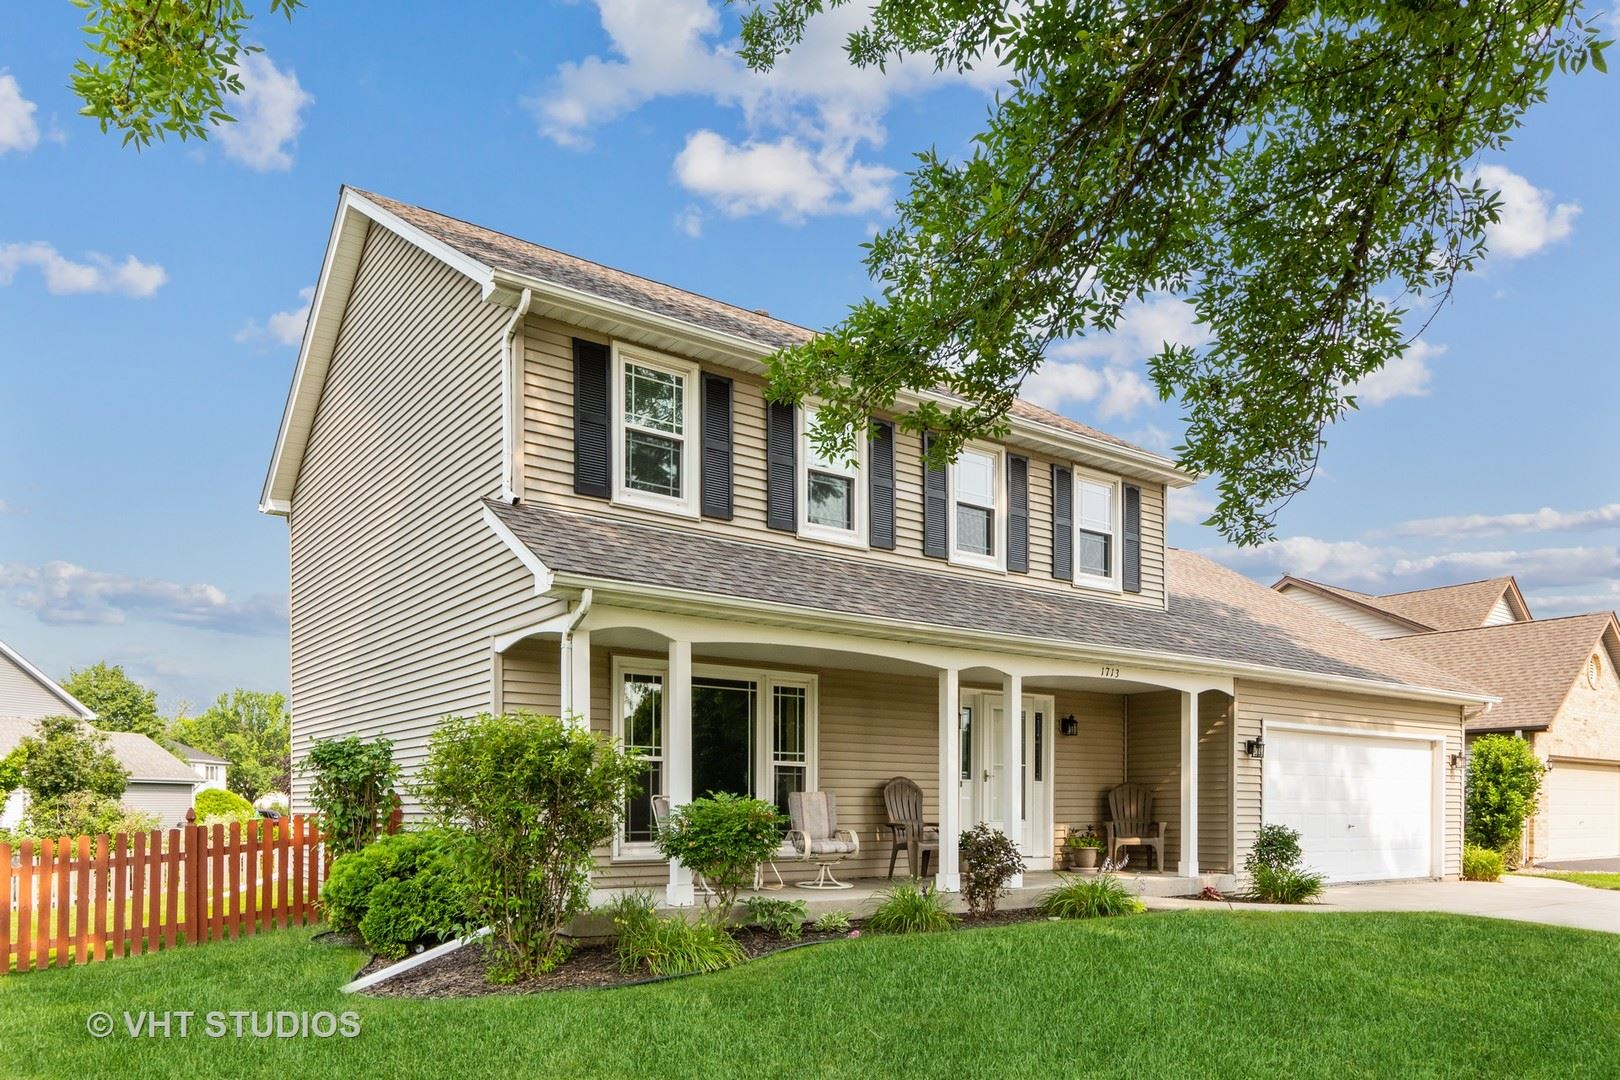 Photo of 1713 Chestnut Hill Road, Plainfield, IL 60586 (MLS # 11162970)